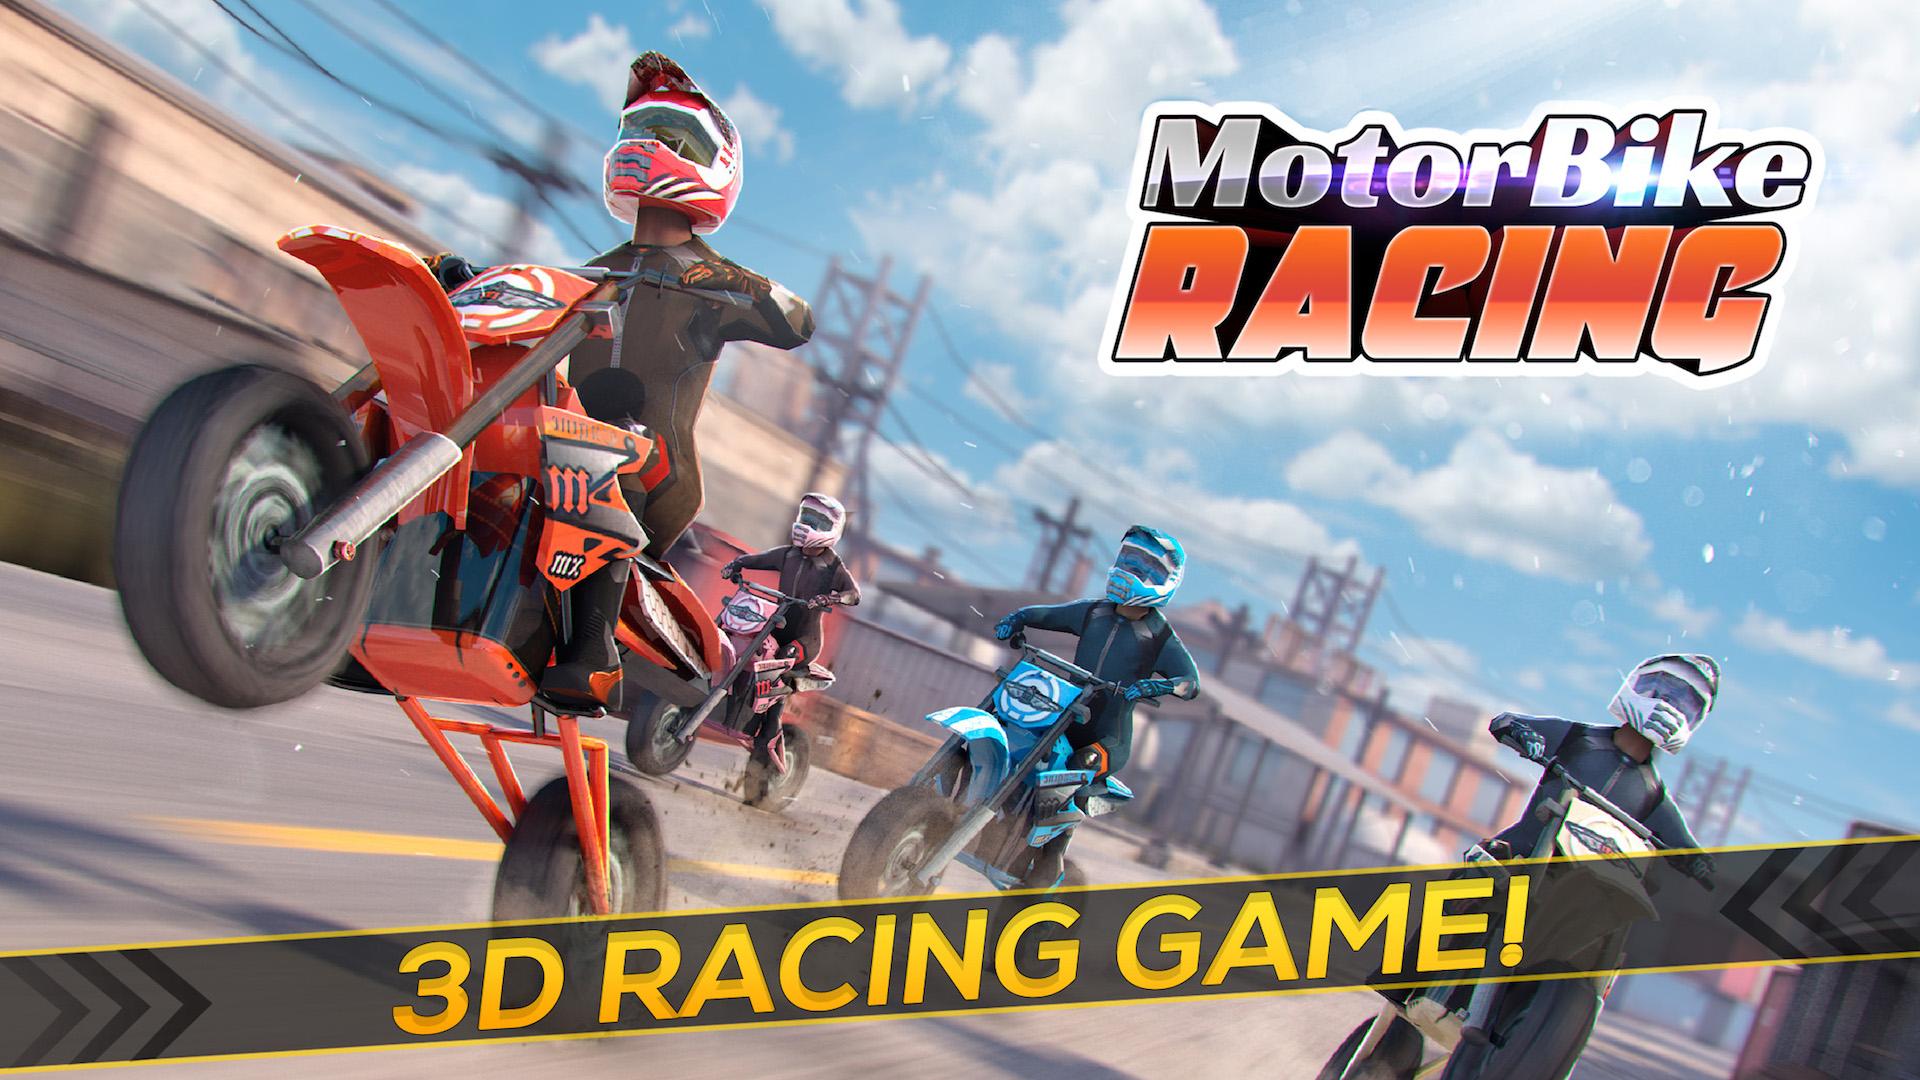 Motorrad Spiele Kostenlos